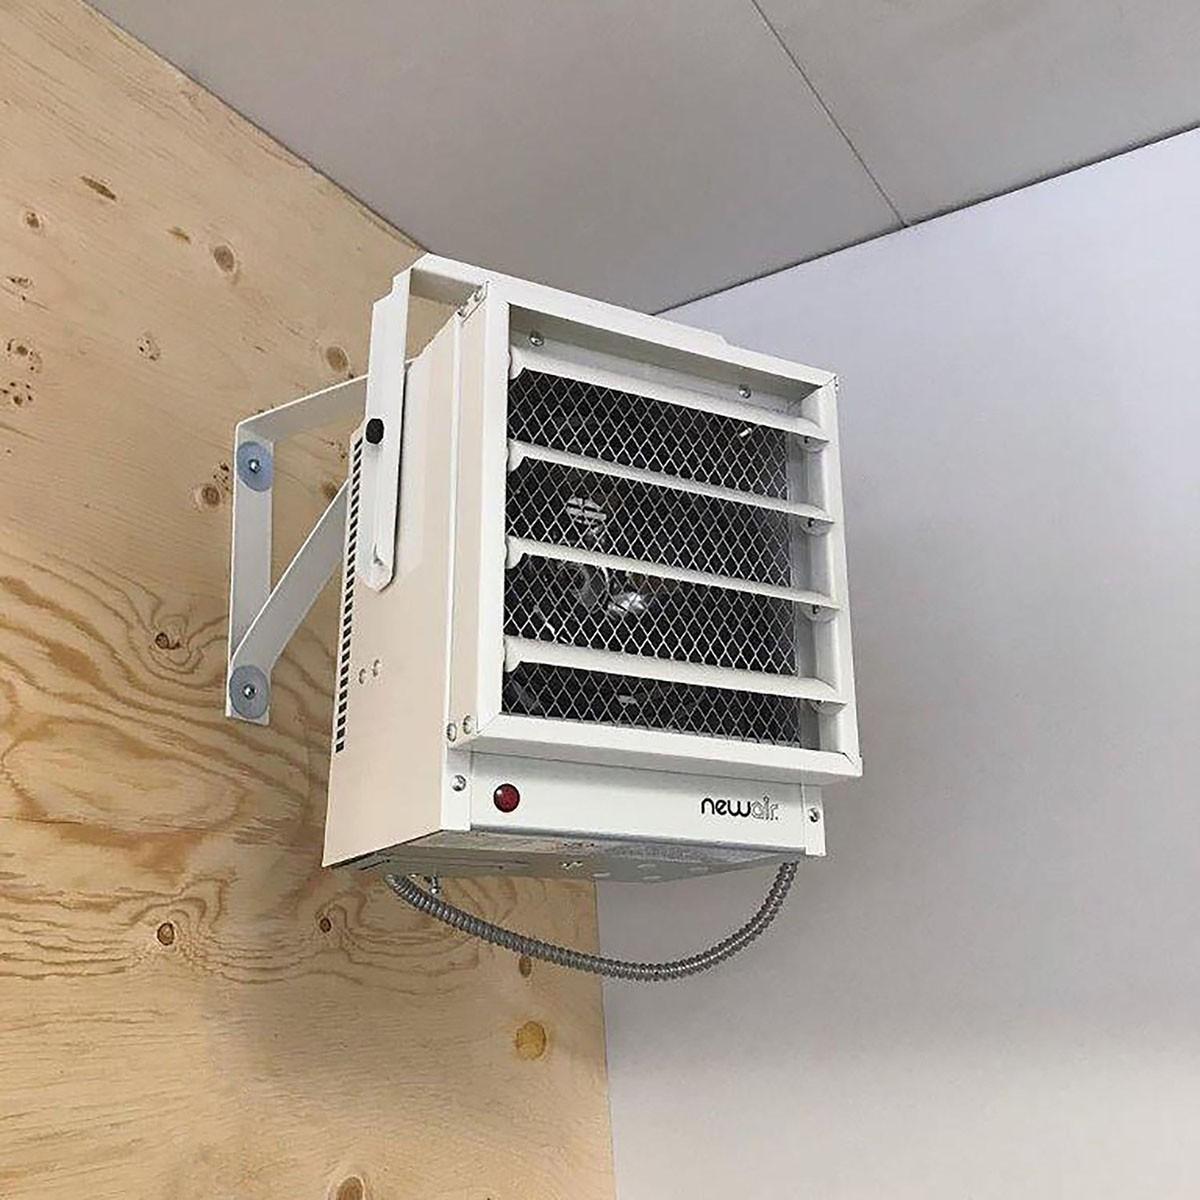 NewAir Hardwired Electric Garage Heater Model: G73